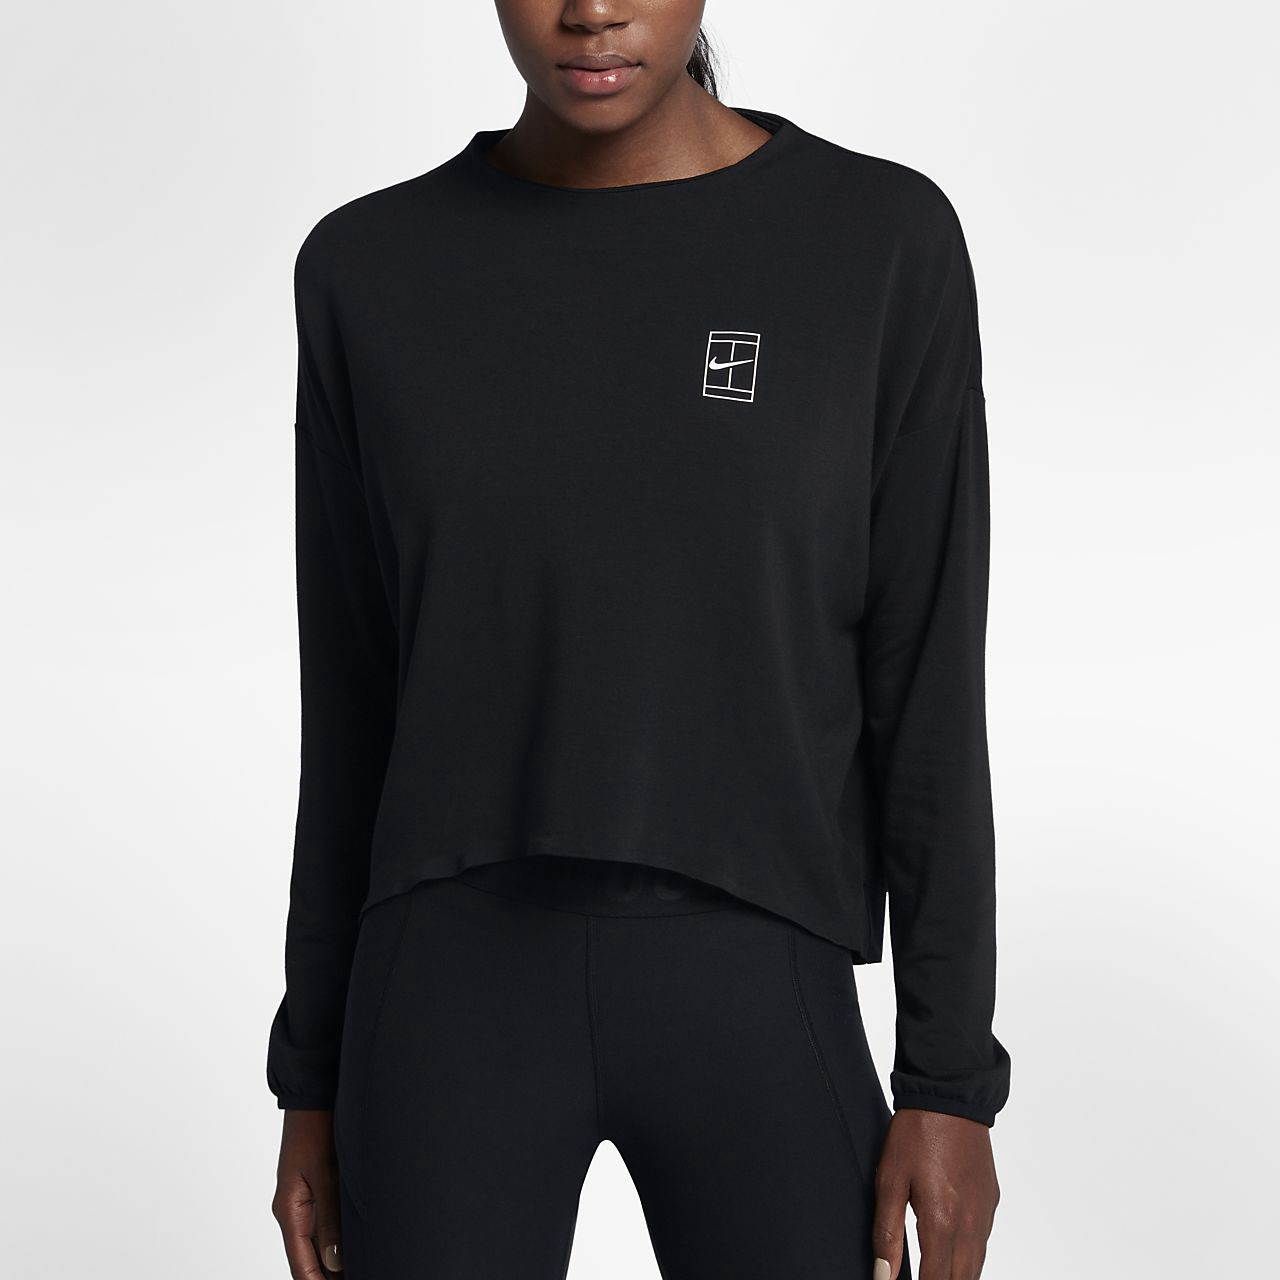 Nike court drifit womens long sleeve tennis top l 12